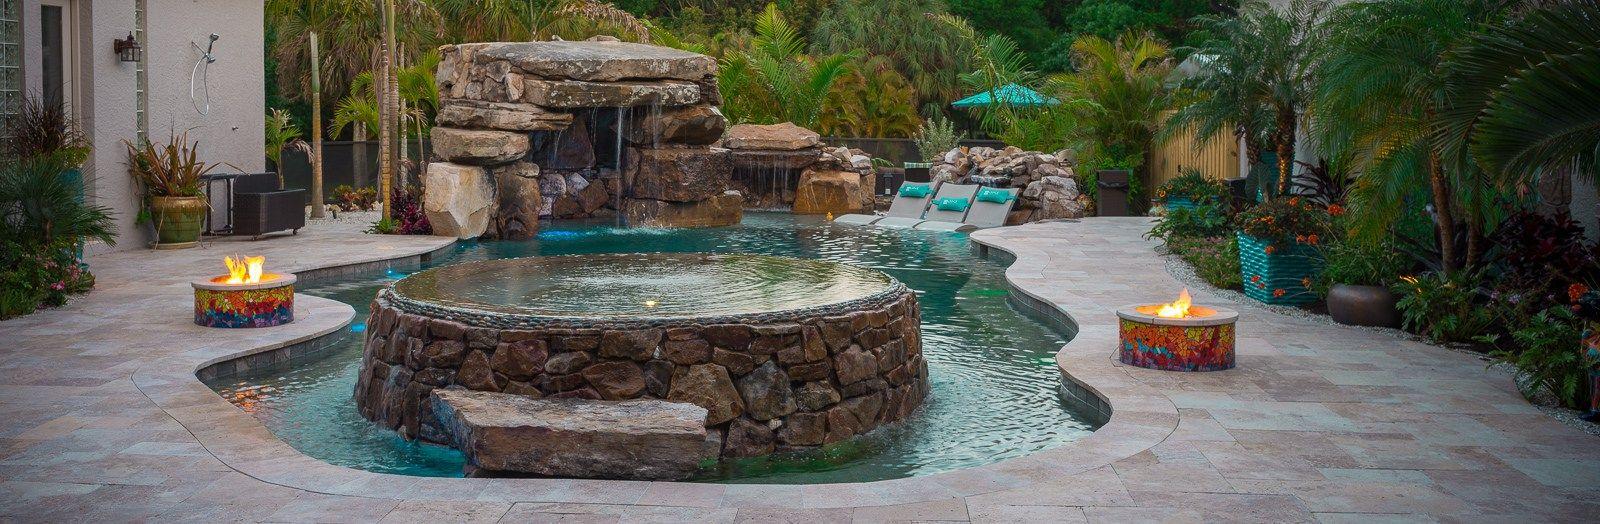 Fiesta De Laguna Lucas Lagoons Insane Pools Pool Houses Pool Hot Tub